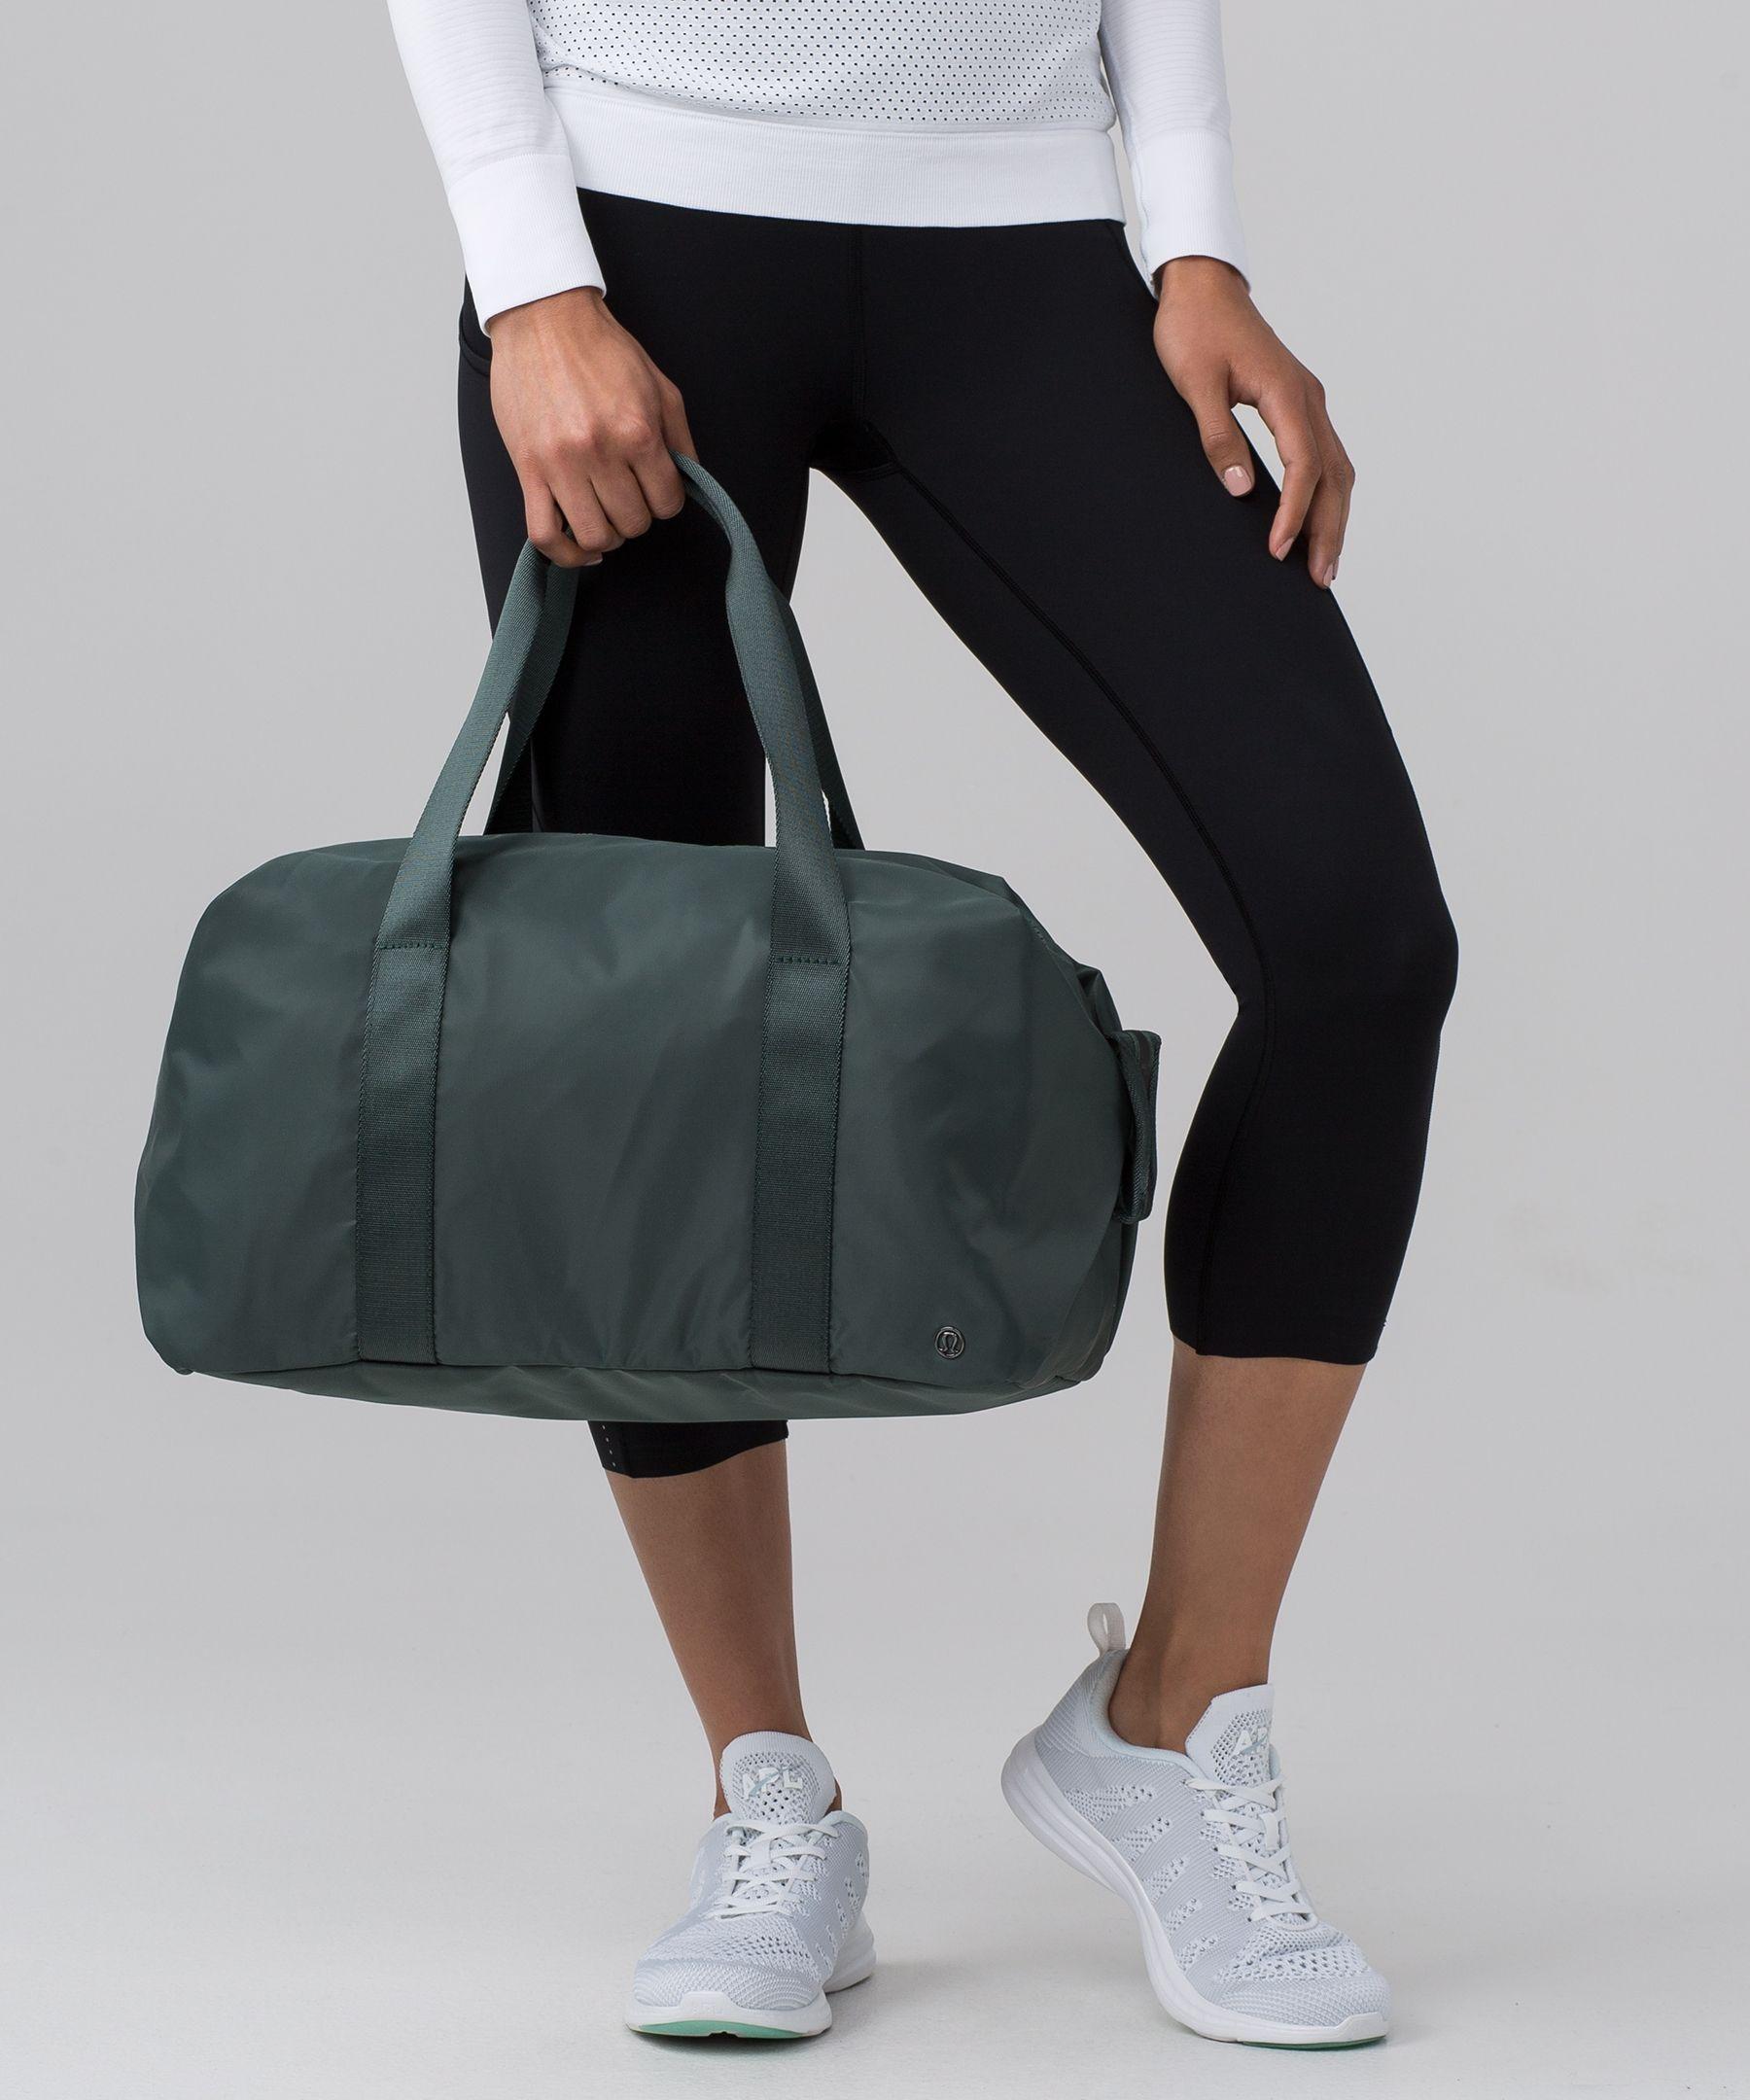 Duffel Bags Cool To Stay Calm Womens Gym Yoga Bag Small Fun Sports Bag for Men